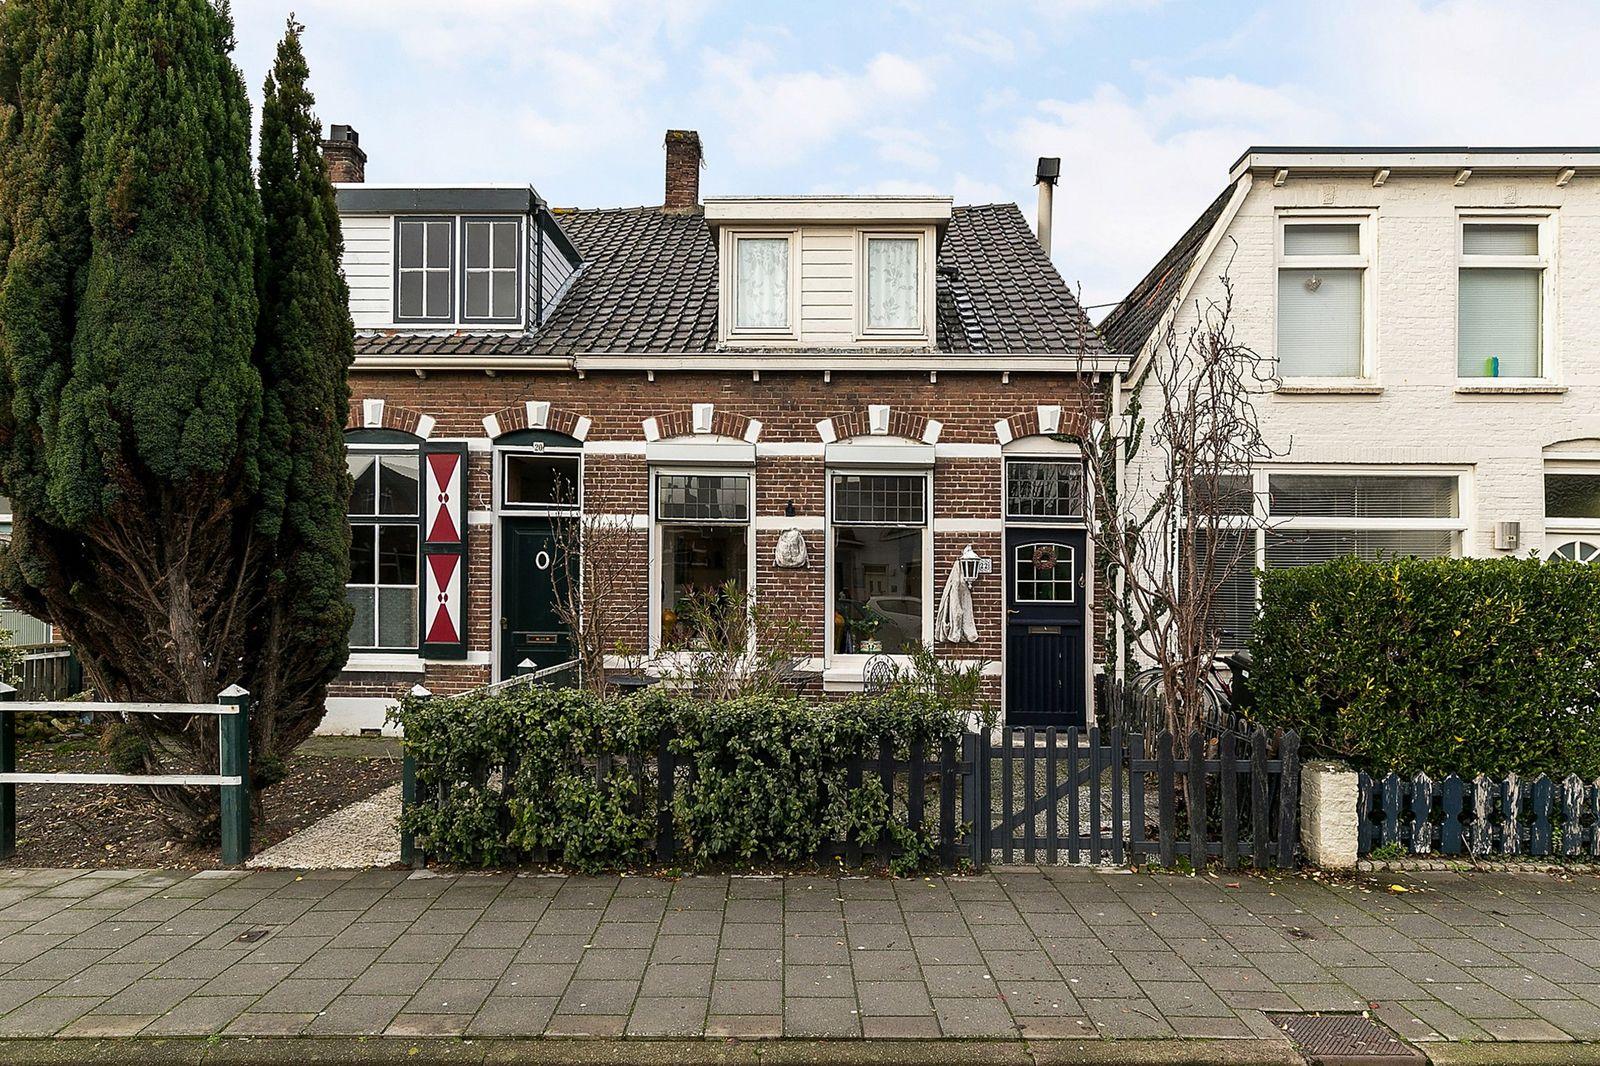 M.A.de Ruijterlaan 22, Goes